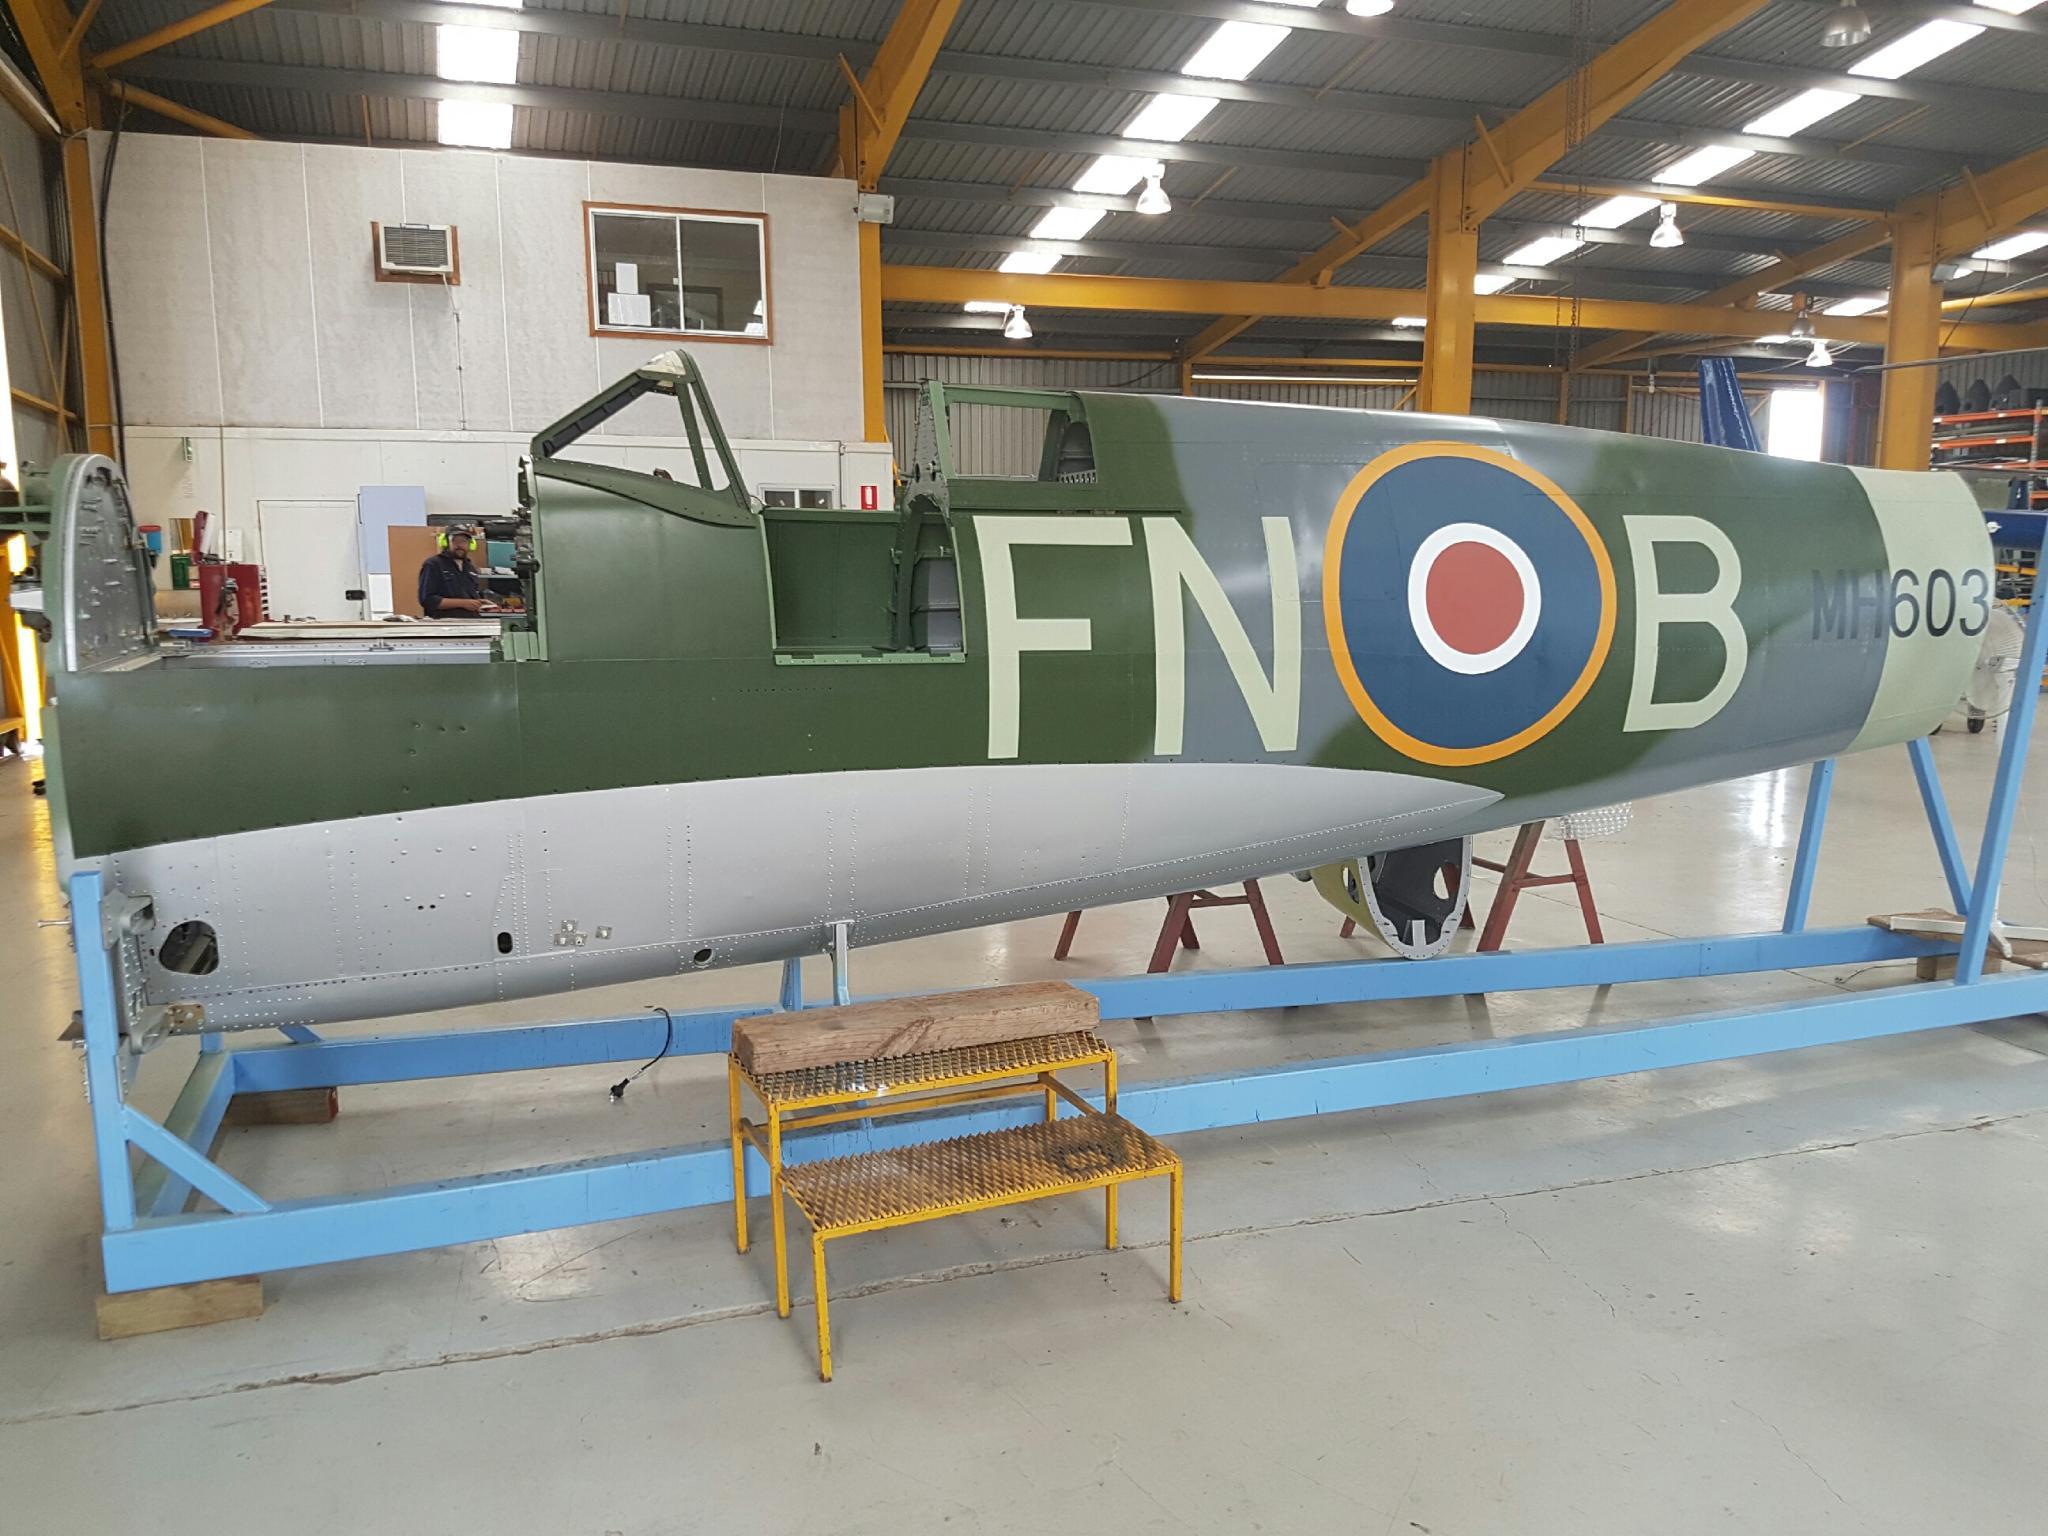 MH603